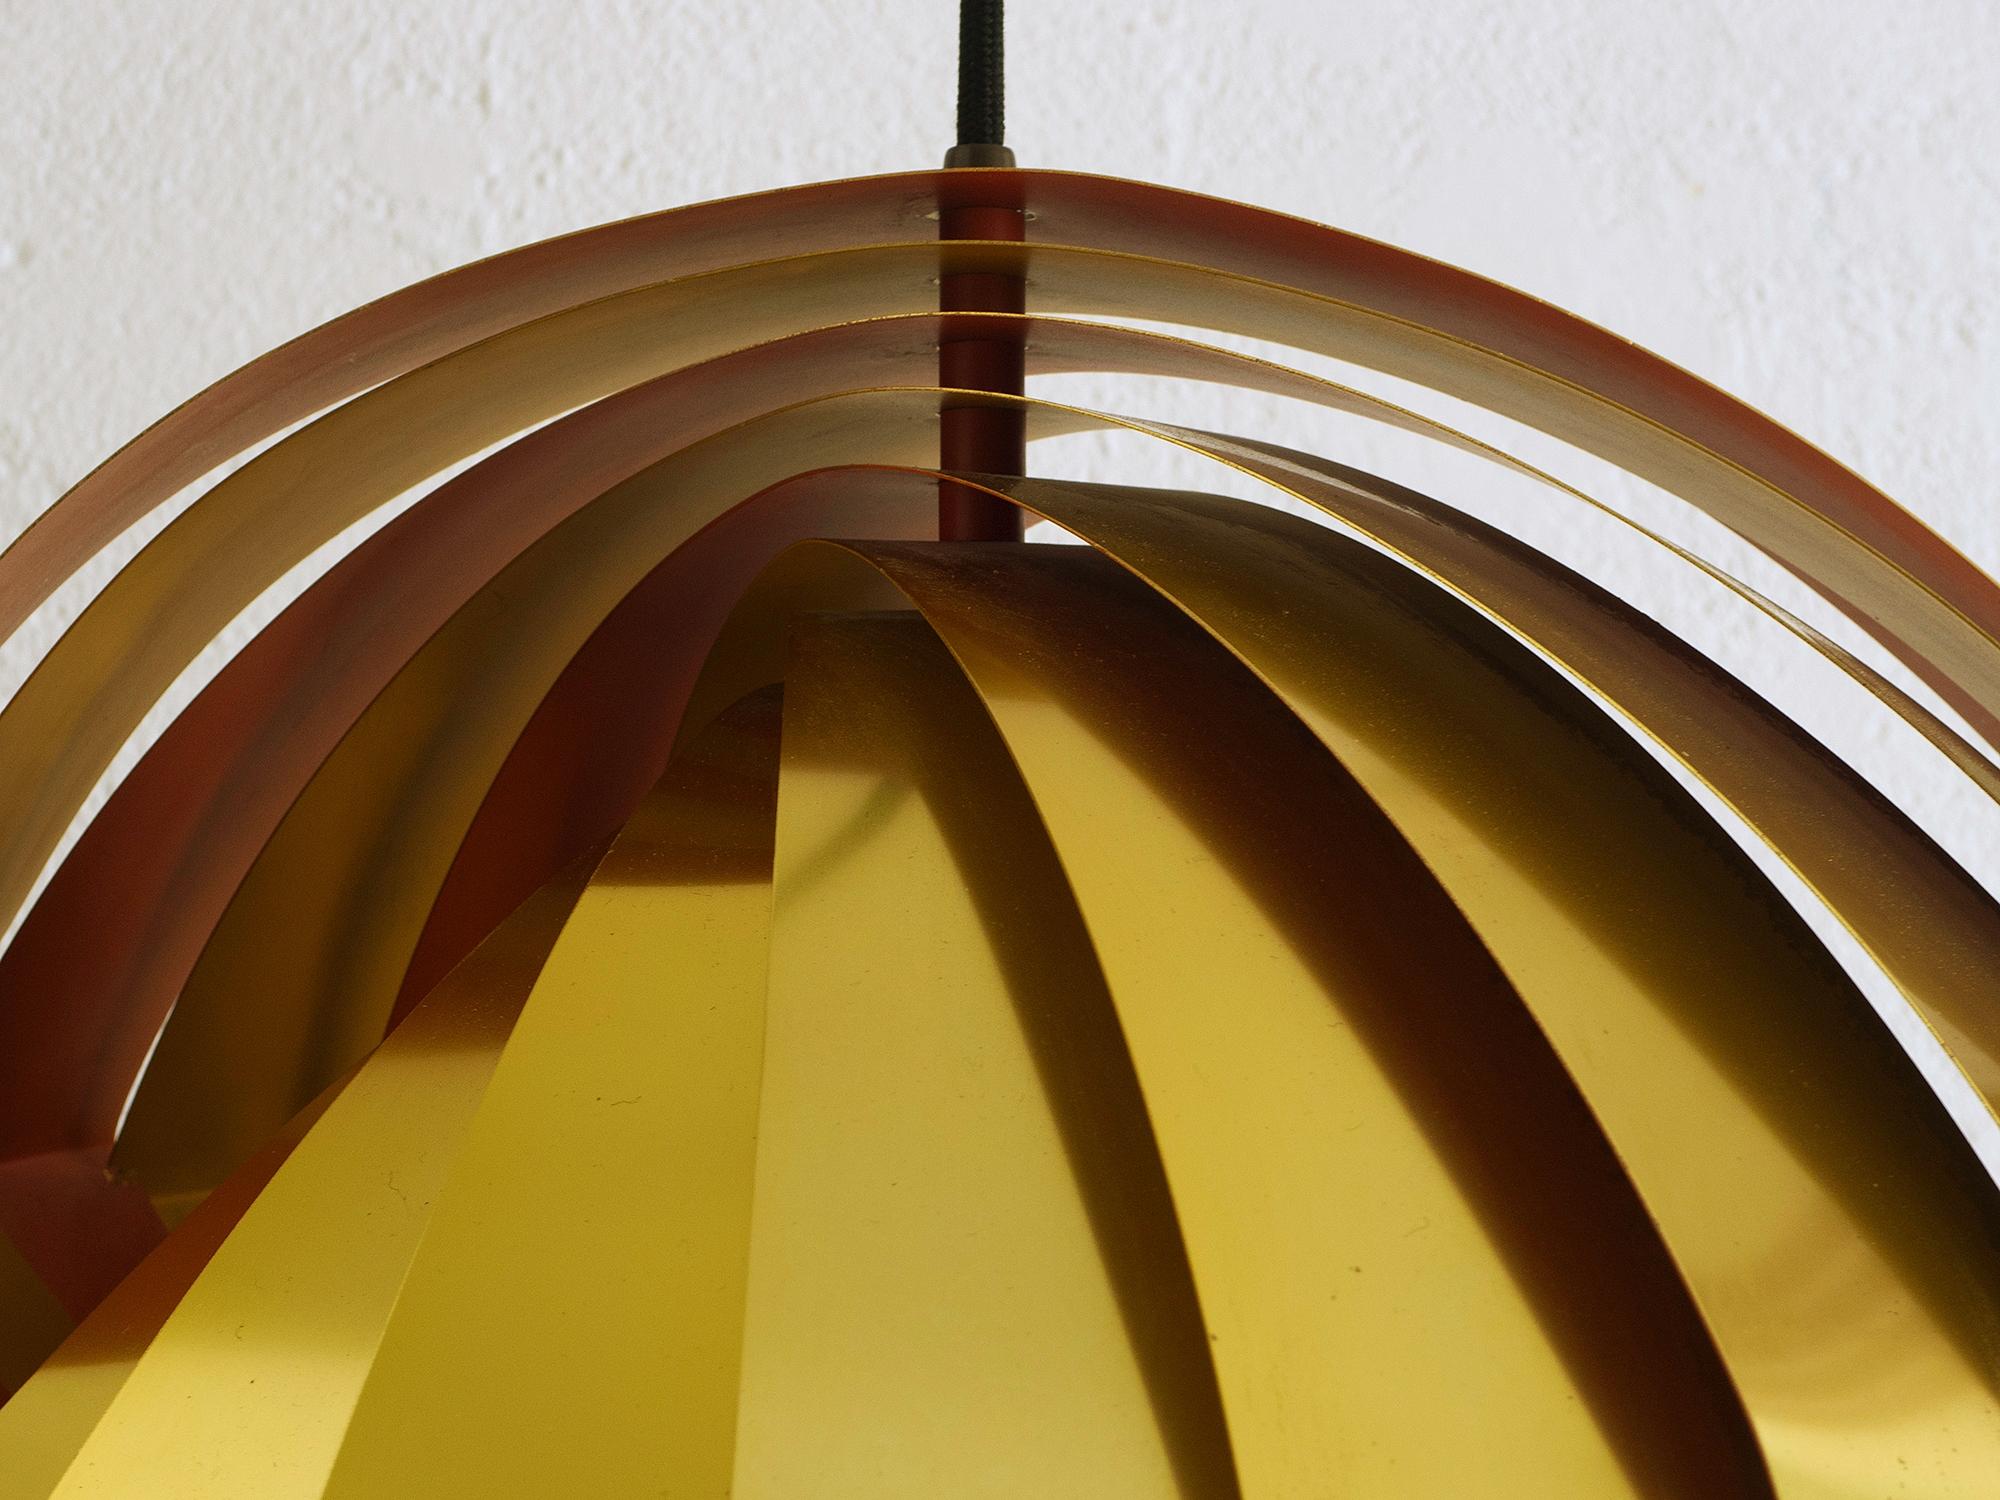 louis-weisdorf-konkilye-pendant-lamp-image-03